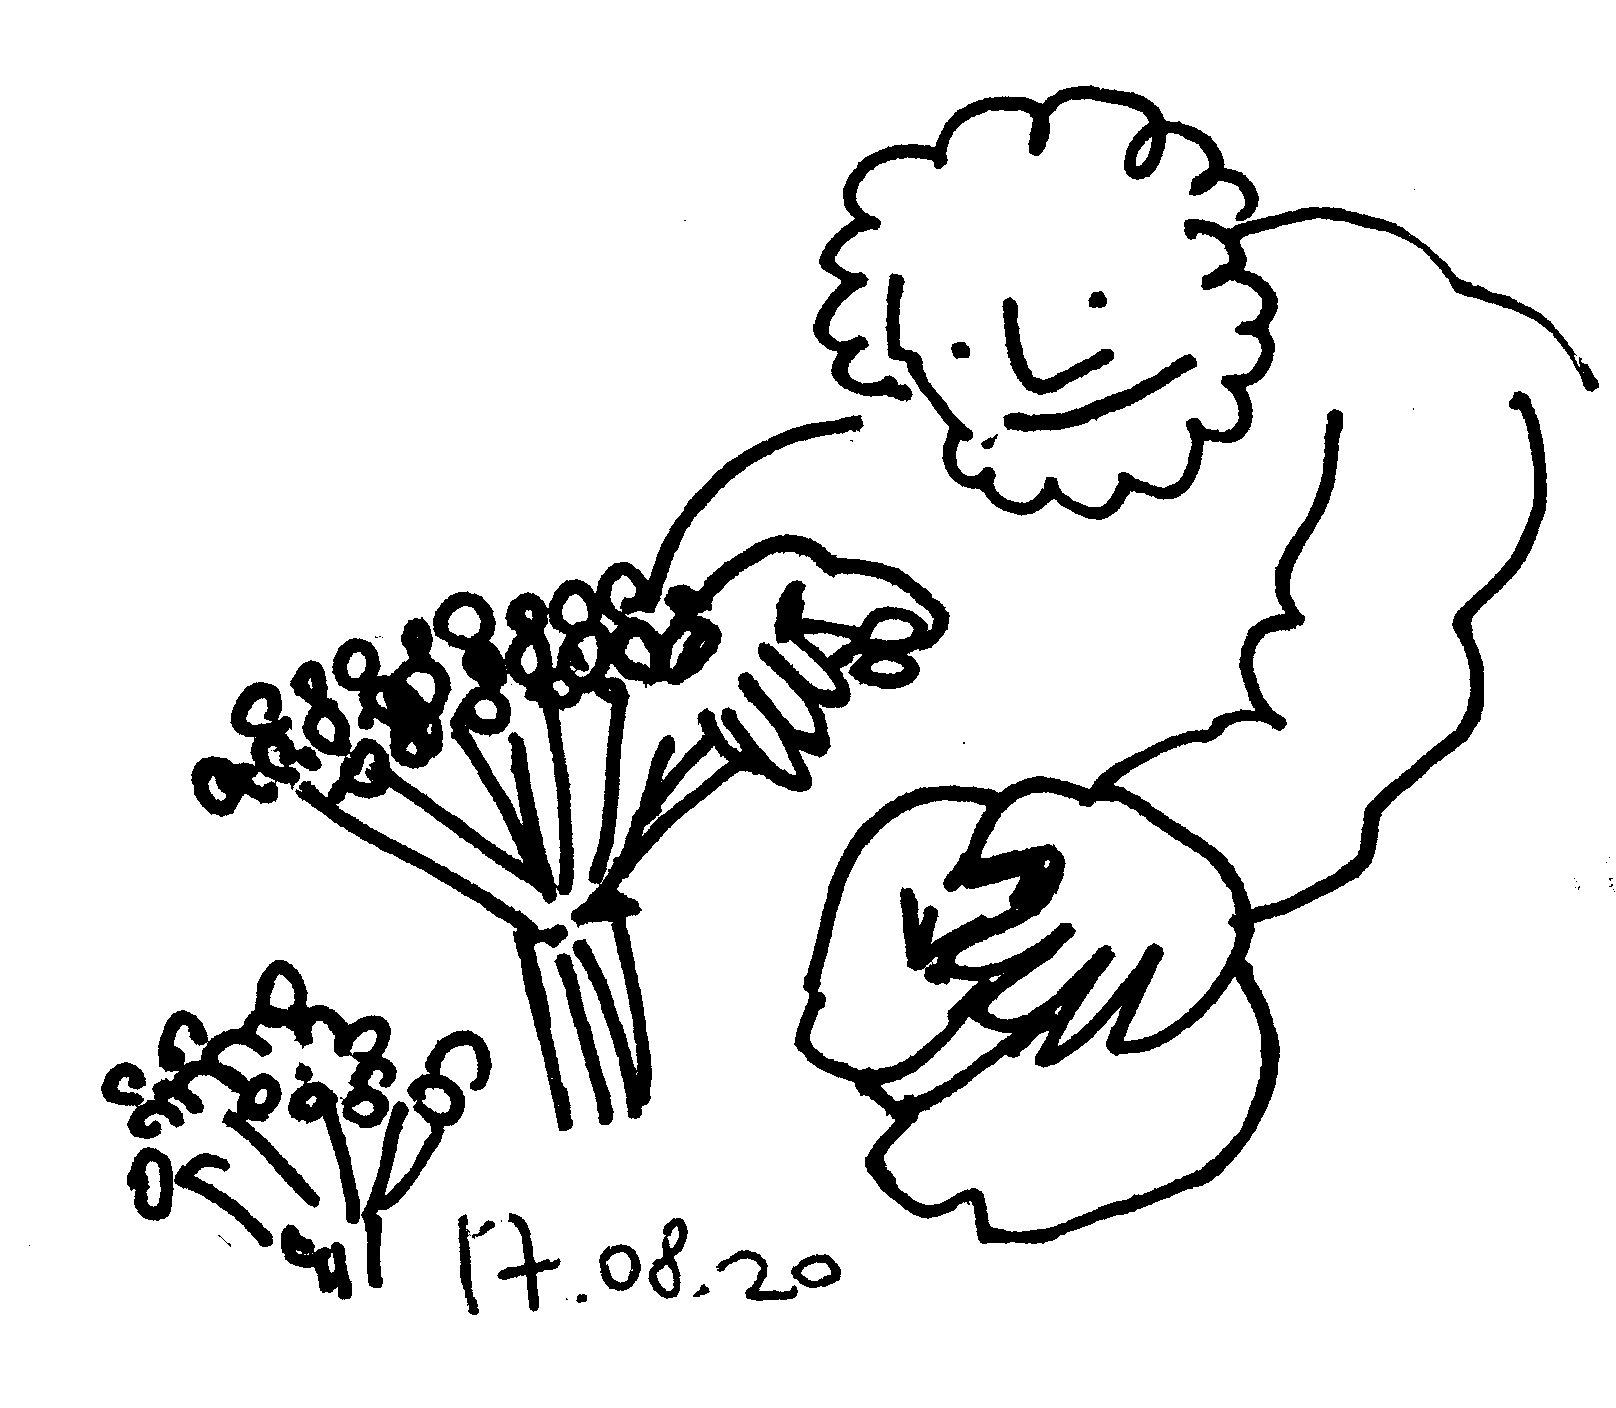 17_08_20_124